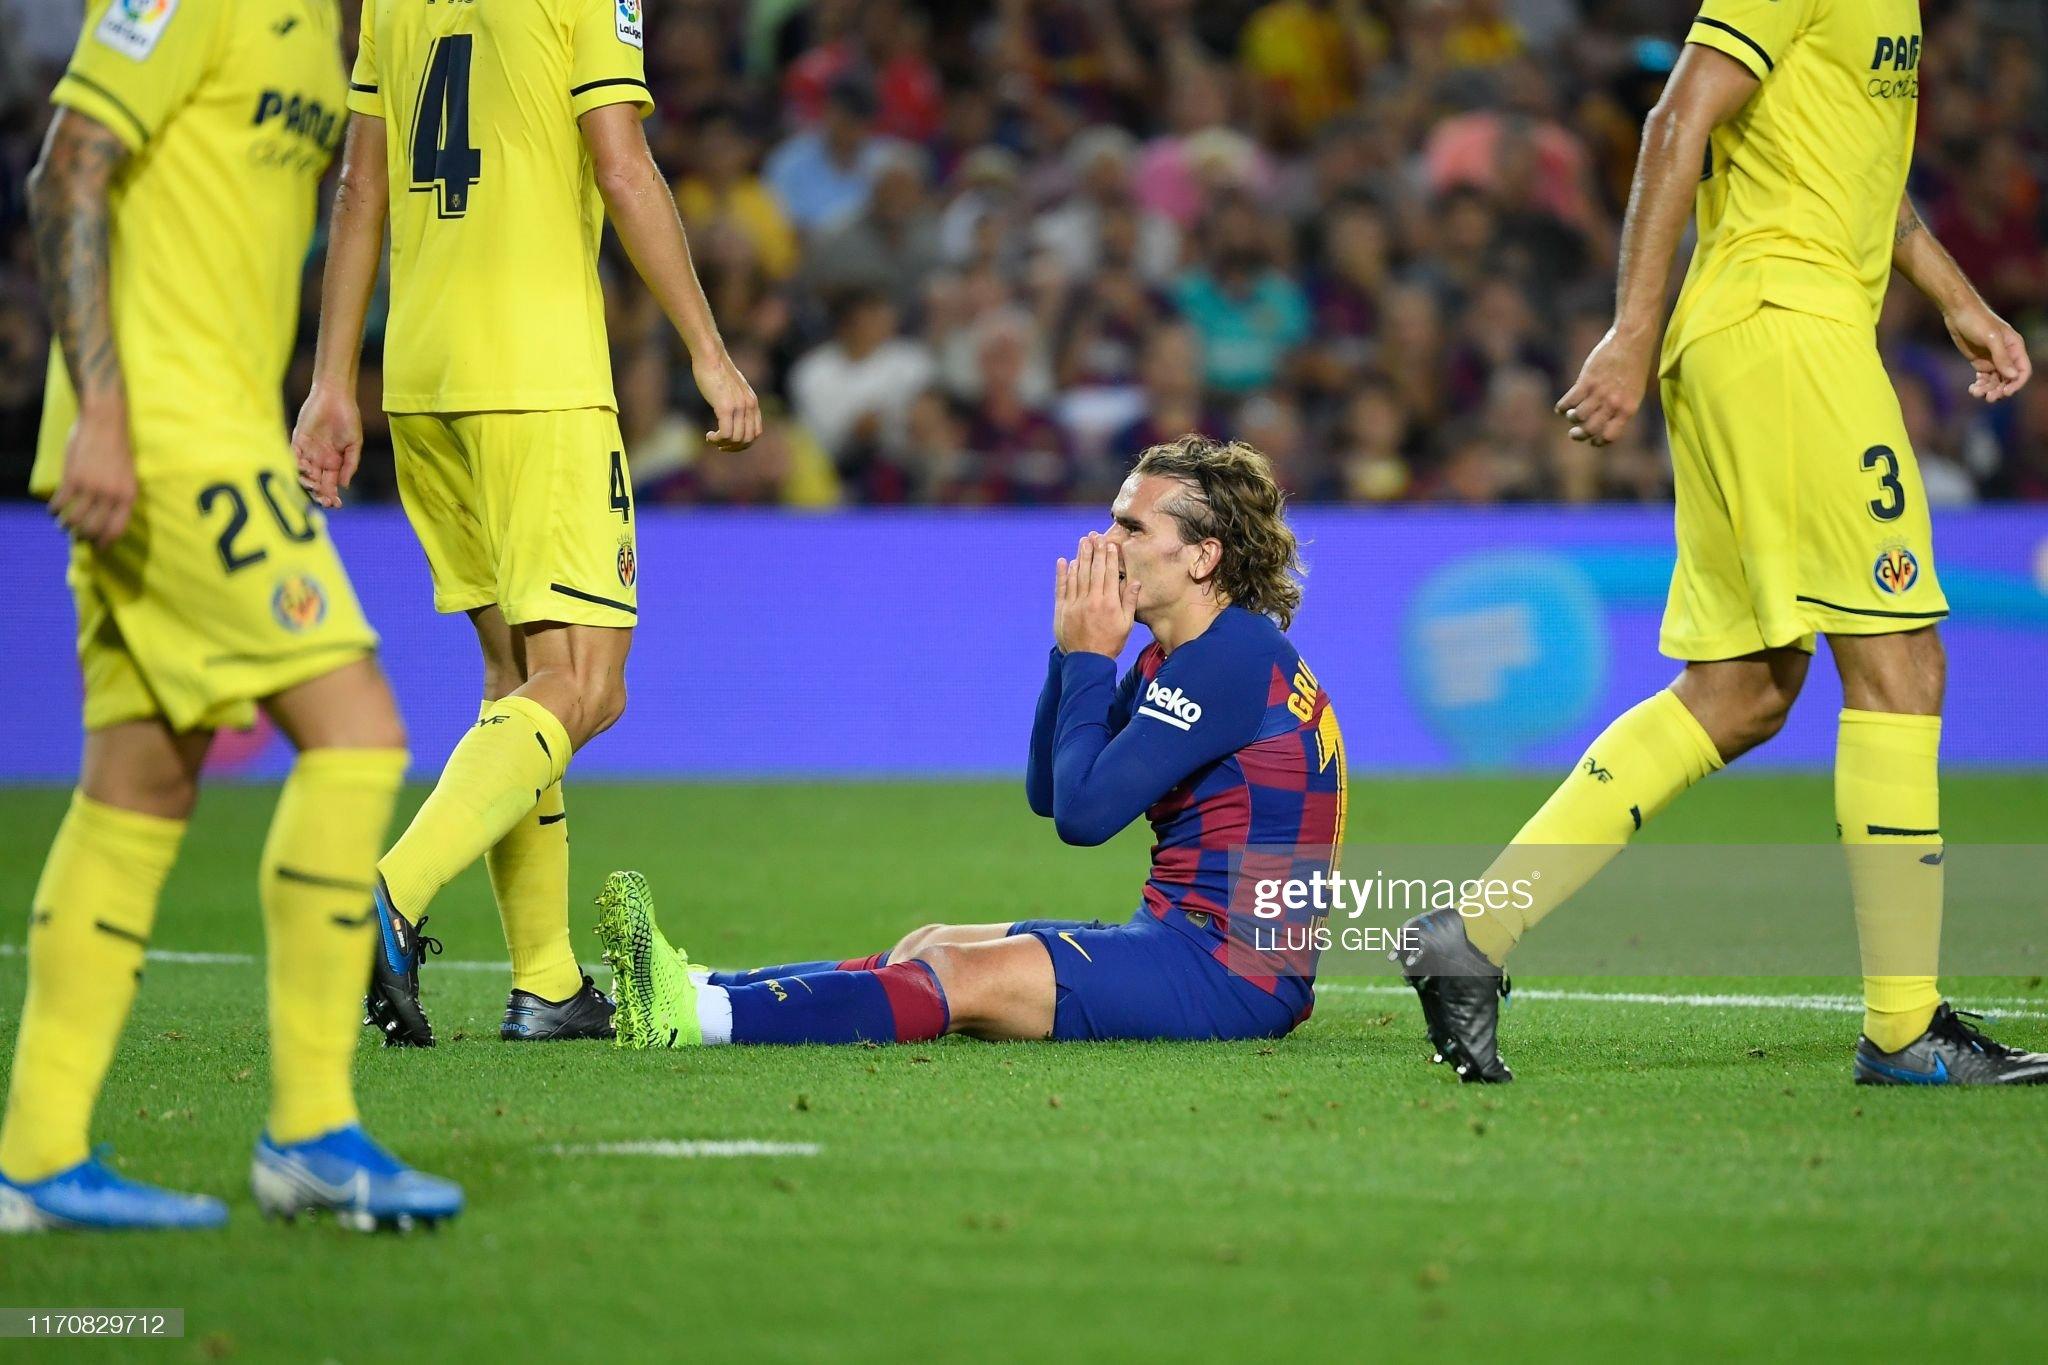 صور مباراة : برشلونة - فياريال 2-1 ( 24-09-2019 )  Barcelonas-french-forward-antoine-griezmann-reacts-after-winning-the-picture-id1170829712?s=2048x2048